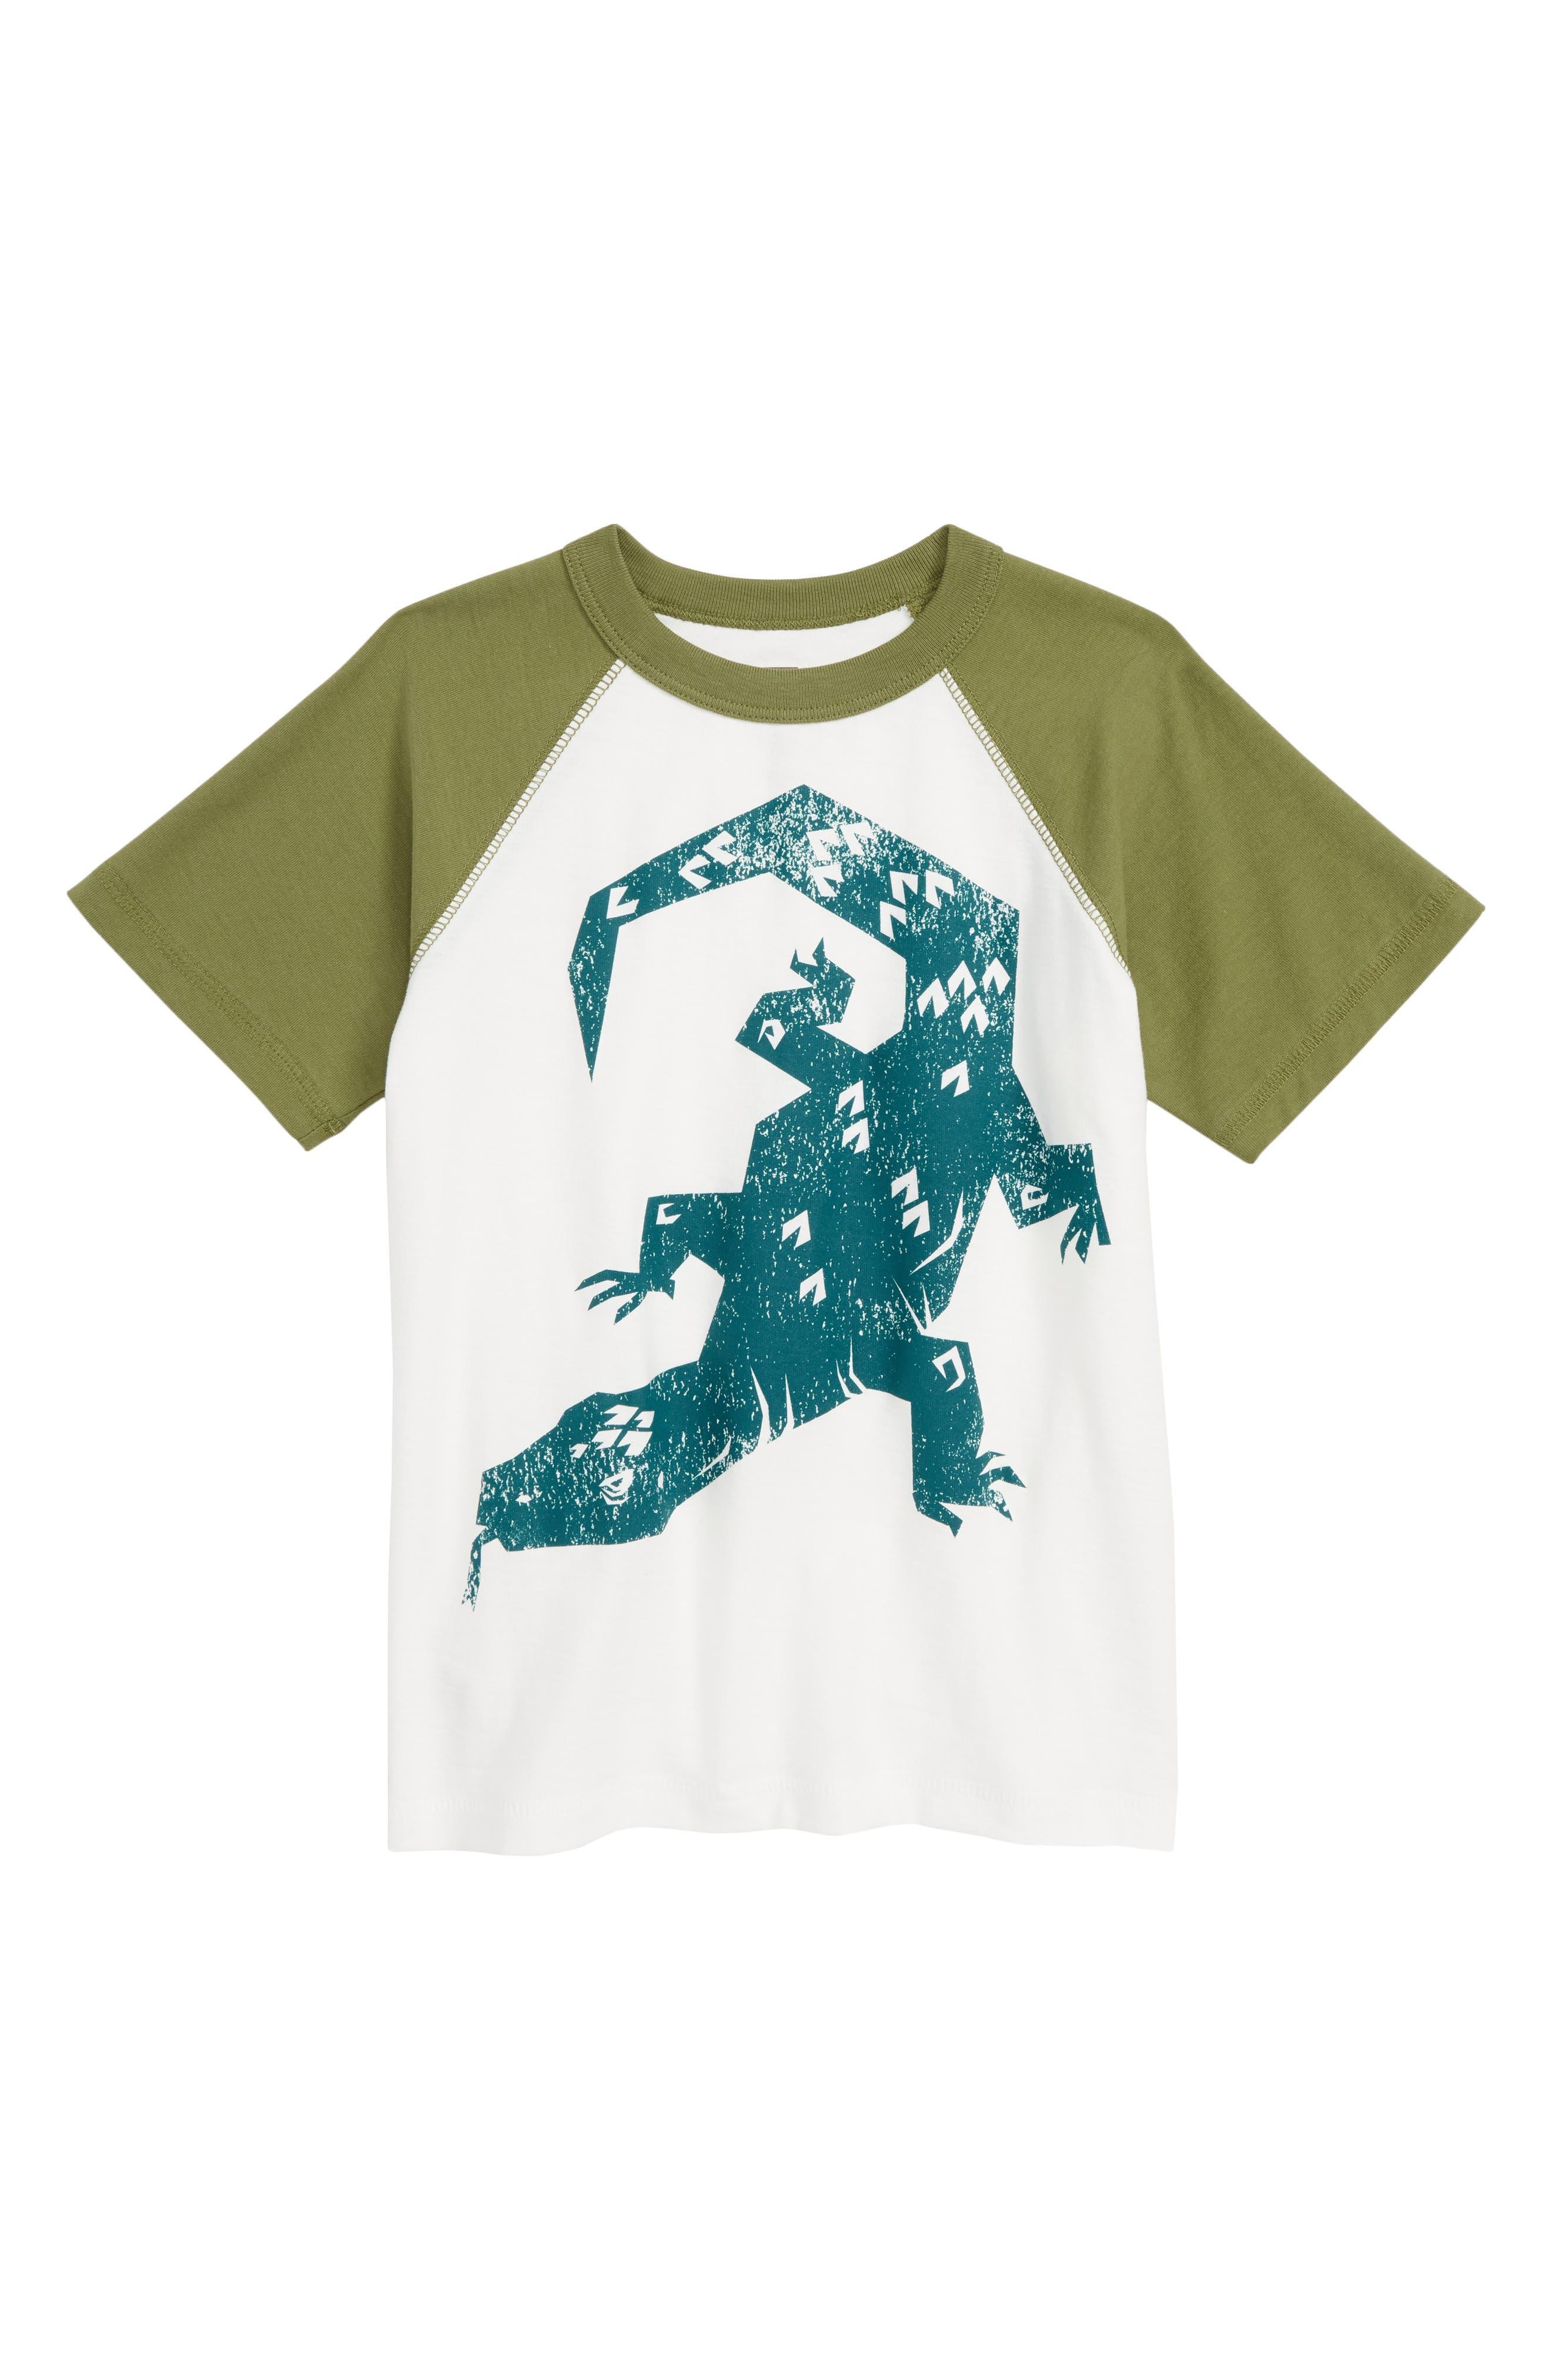 TEA COLLECTION, Komodo Graphic T-Shirt, Main thumbnail 1, color, PAPERWHITE